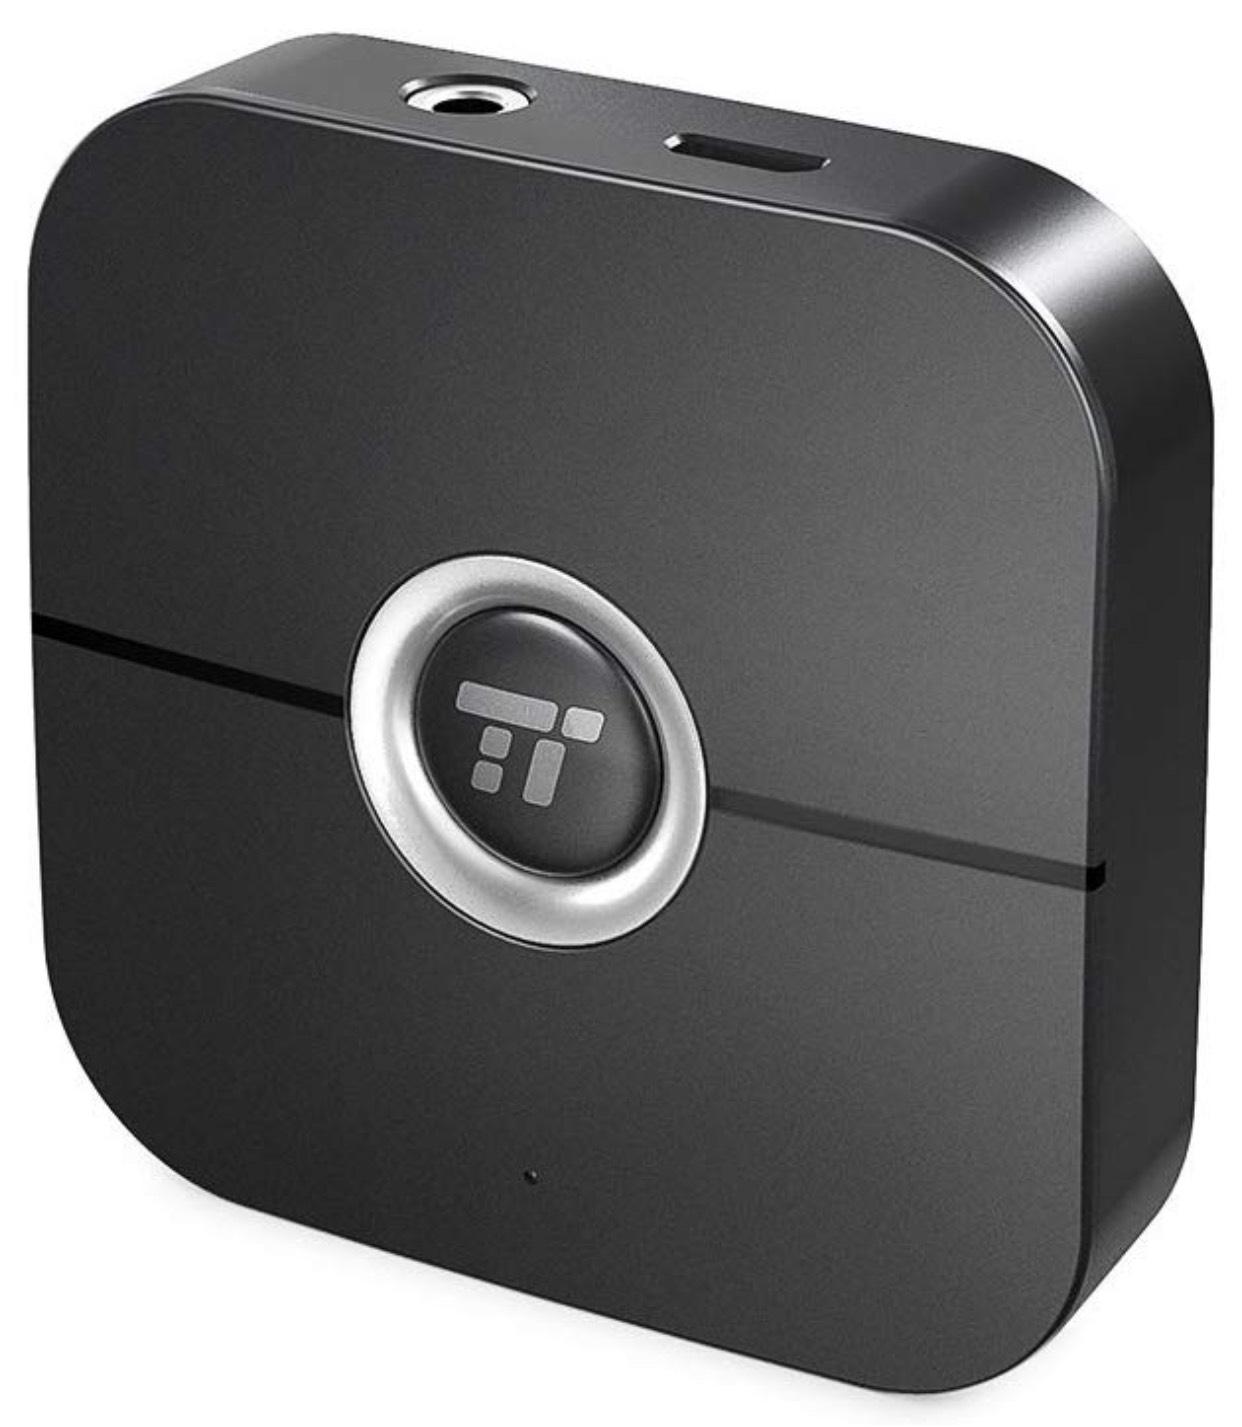 TaoTronics Bluetooth-Empfänger TT-BR010 (Bluetooth 4.2,Klinke-/Klinke-Cinch- und USB-Kabel)